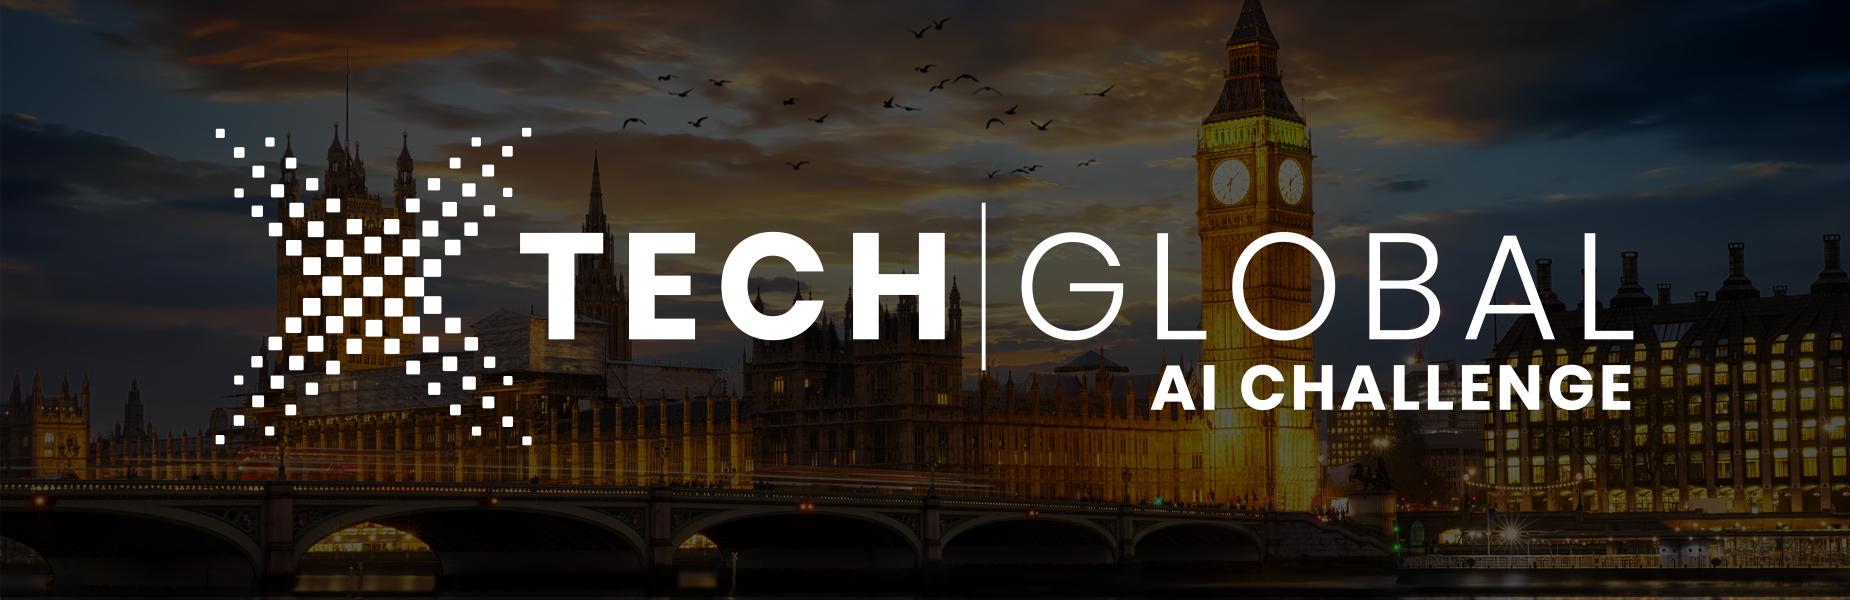 XTECH GLOBAL AI CHALLENGE Banner